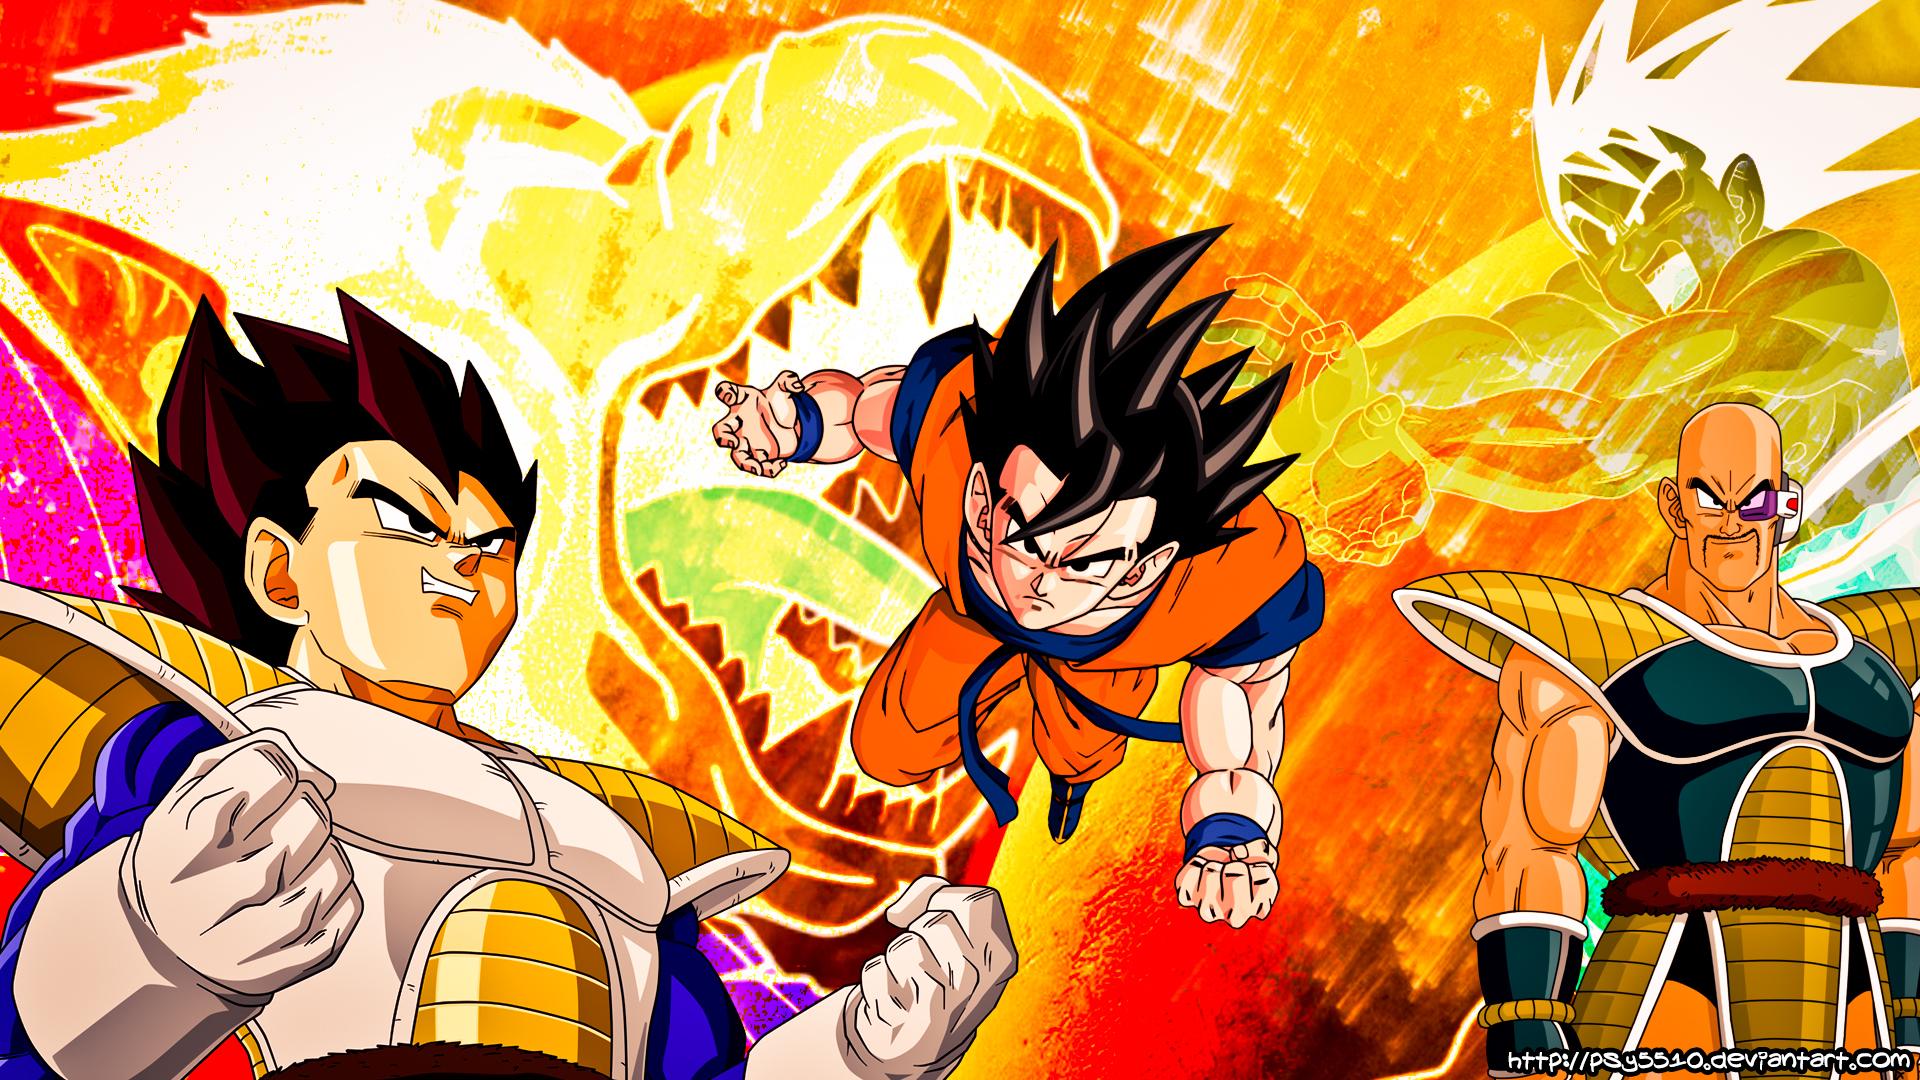 Dragon Ball Z Wallpaper Deviantart